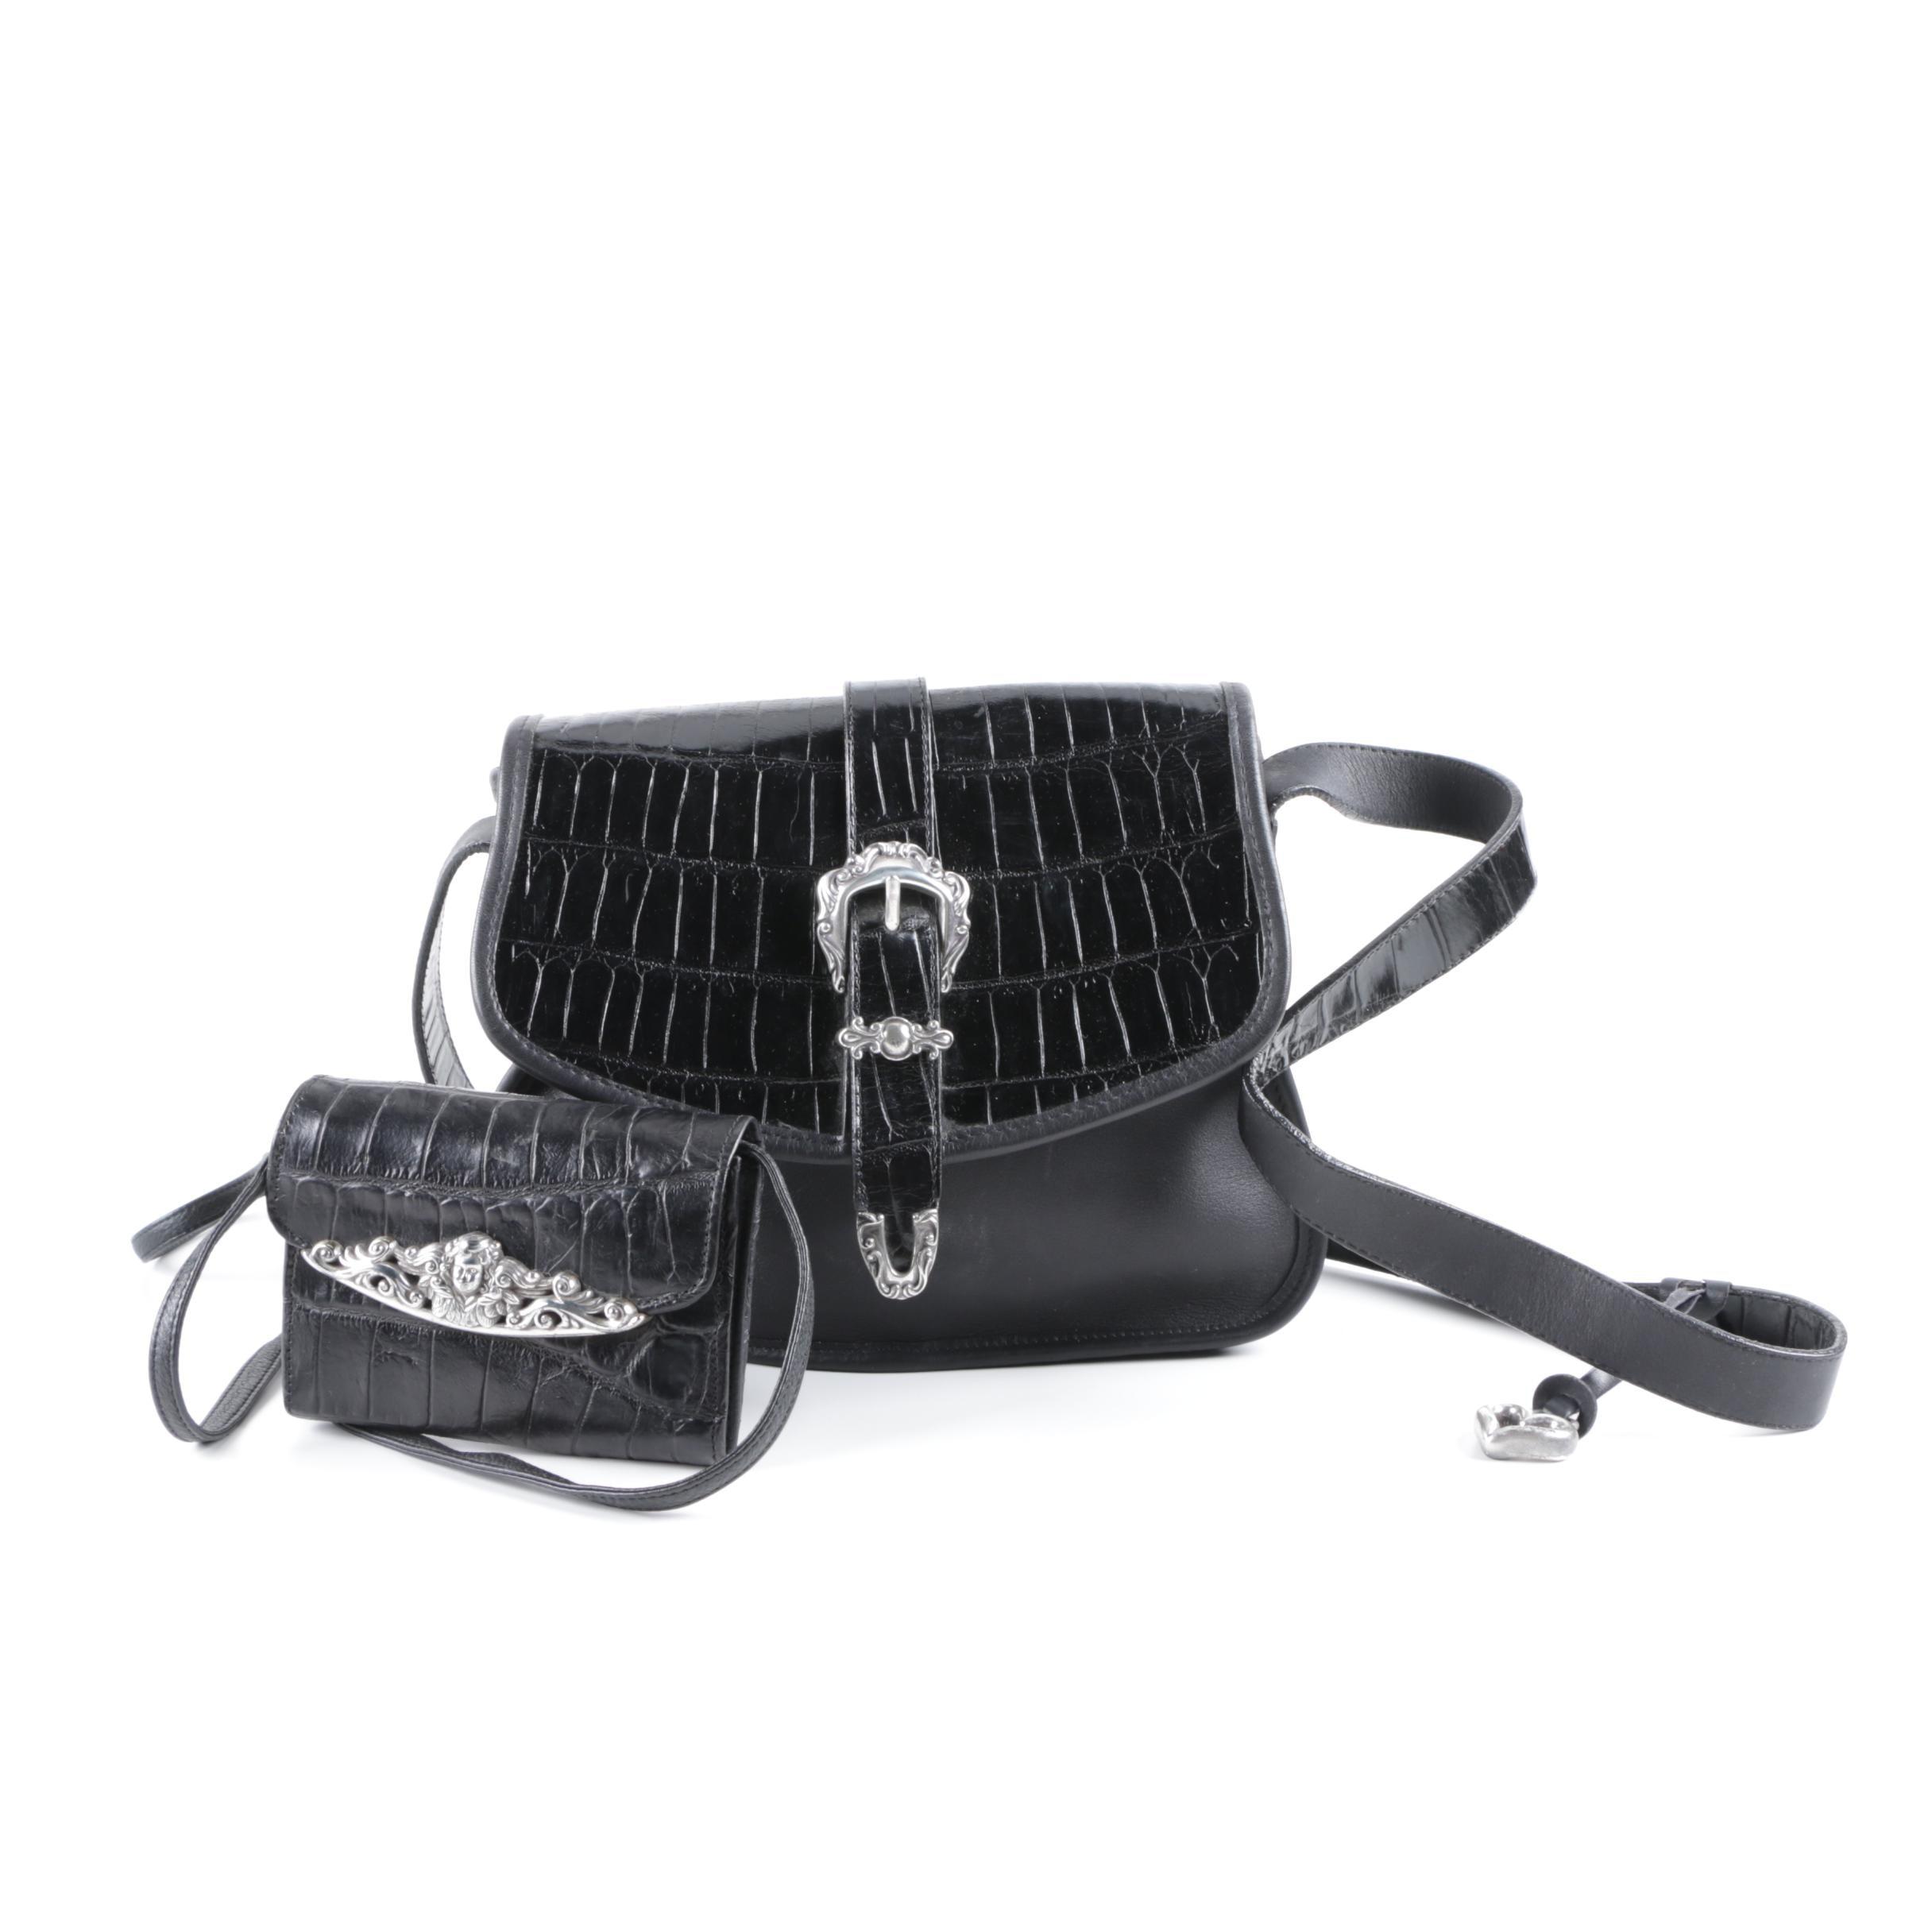 Brighton Black Leather Saddle Handbag and Crossbody Wallet